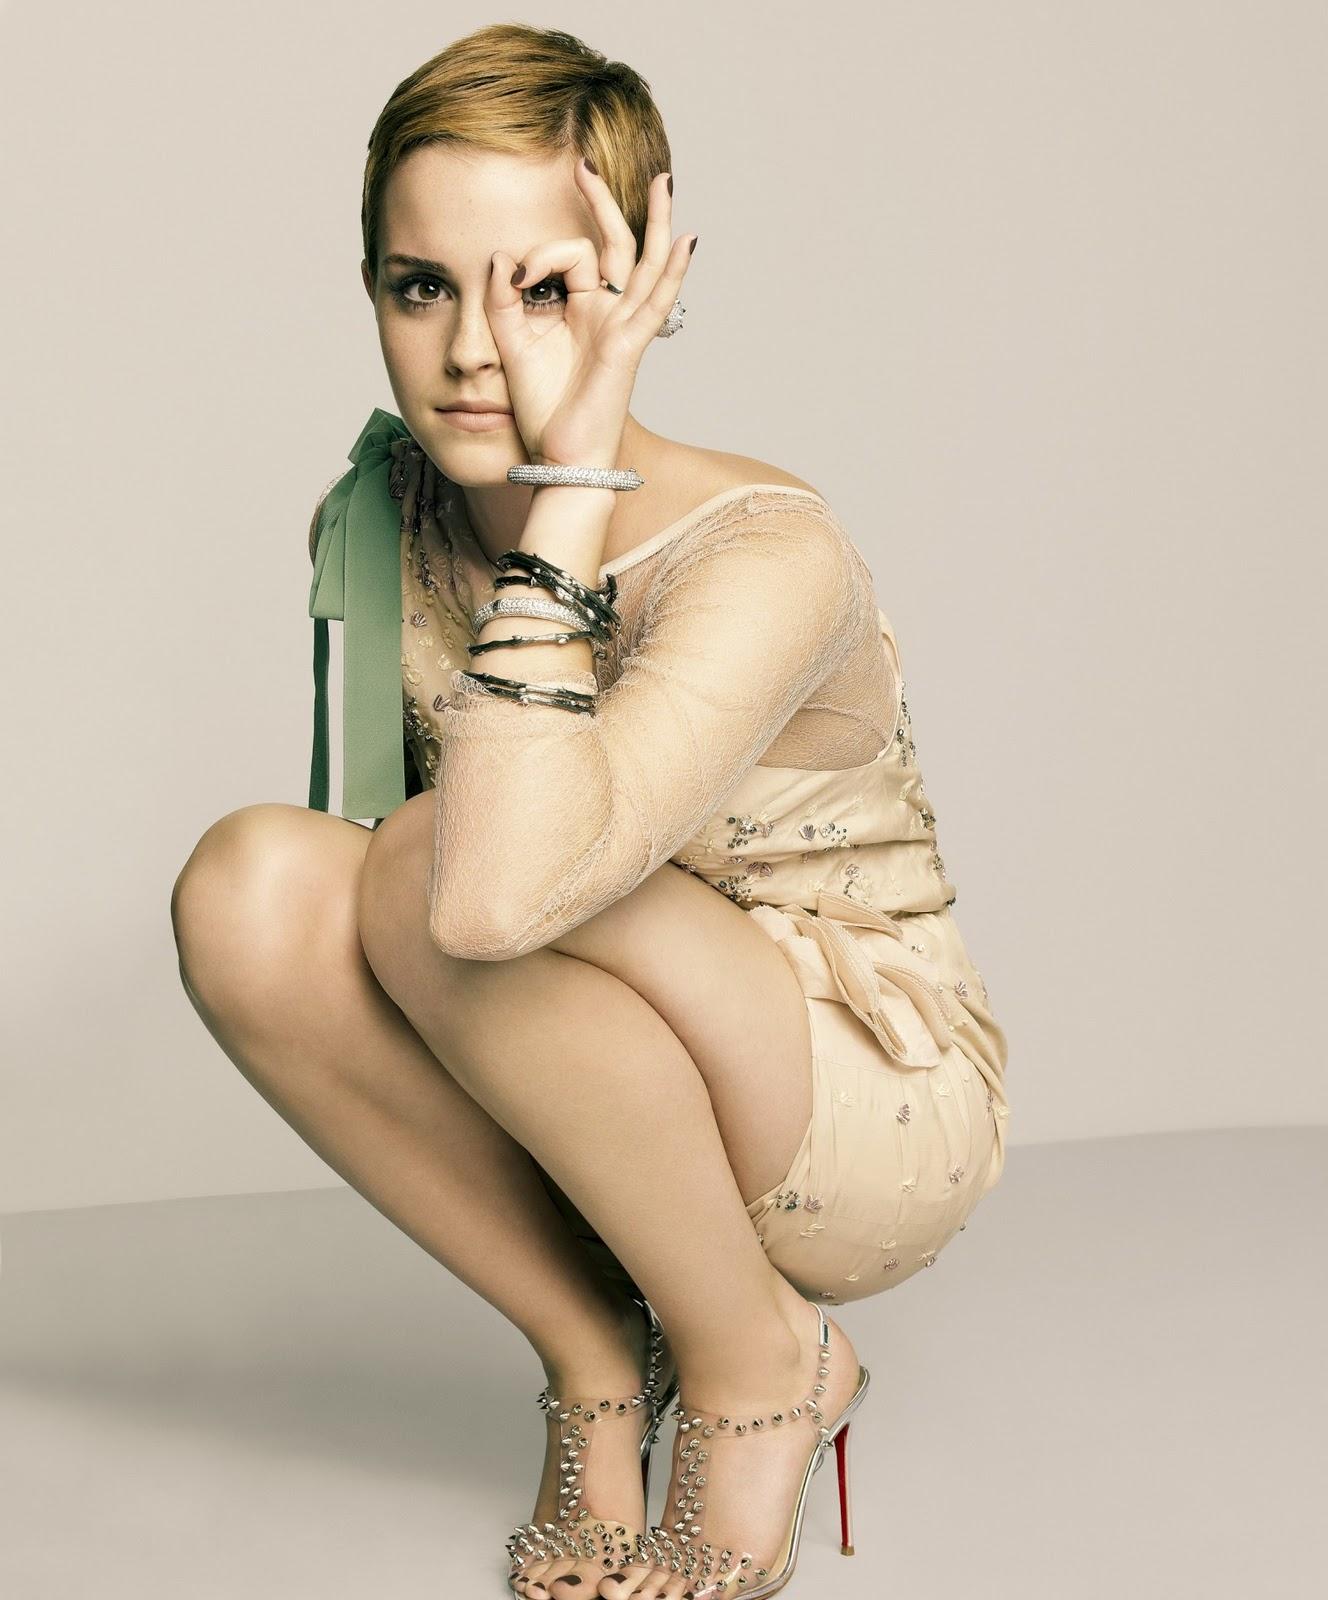 http://4.bp.blogspot.com/_r2KU-uyA9hc/TO8kuxLnzSI/AAAAAAAABMQ/X4am1pGJtb0/s1600/Emma-Watson-63.jpg